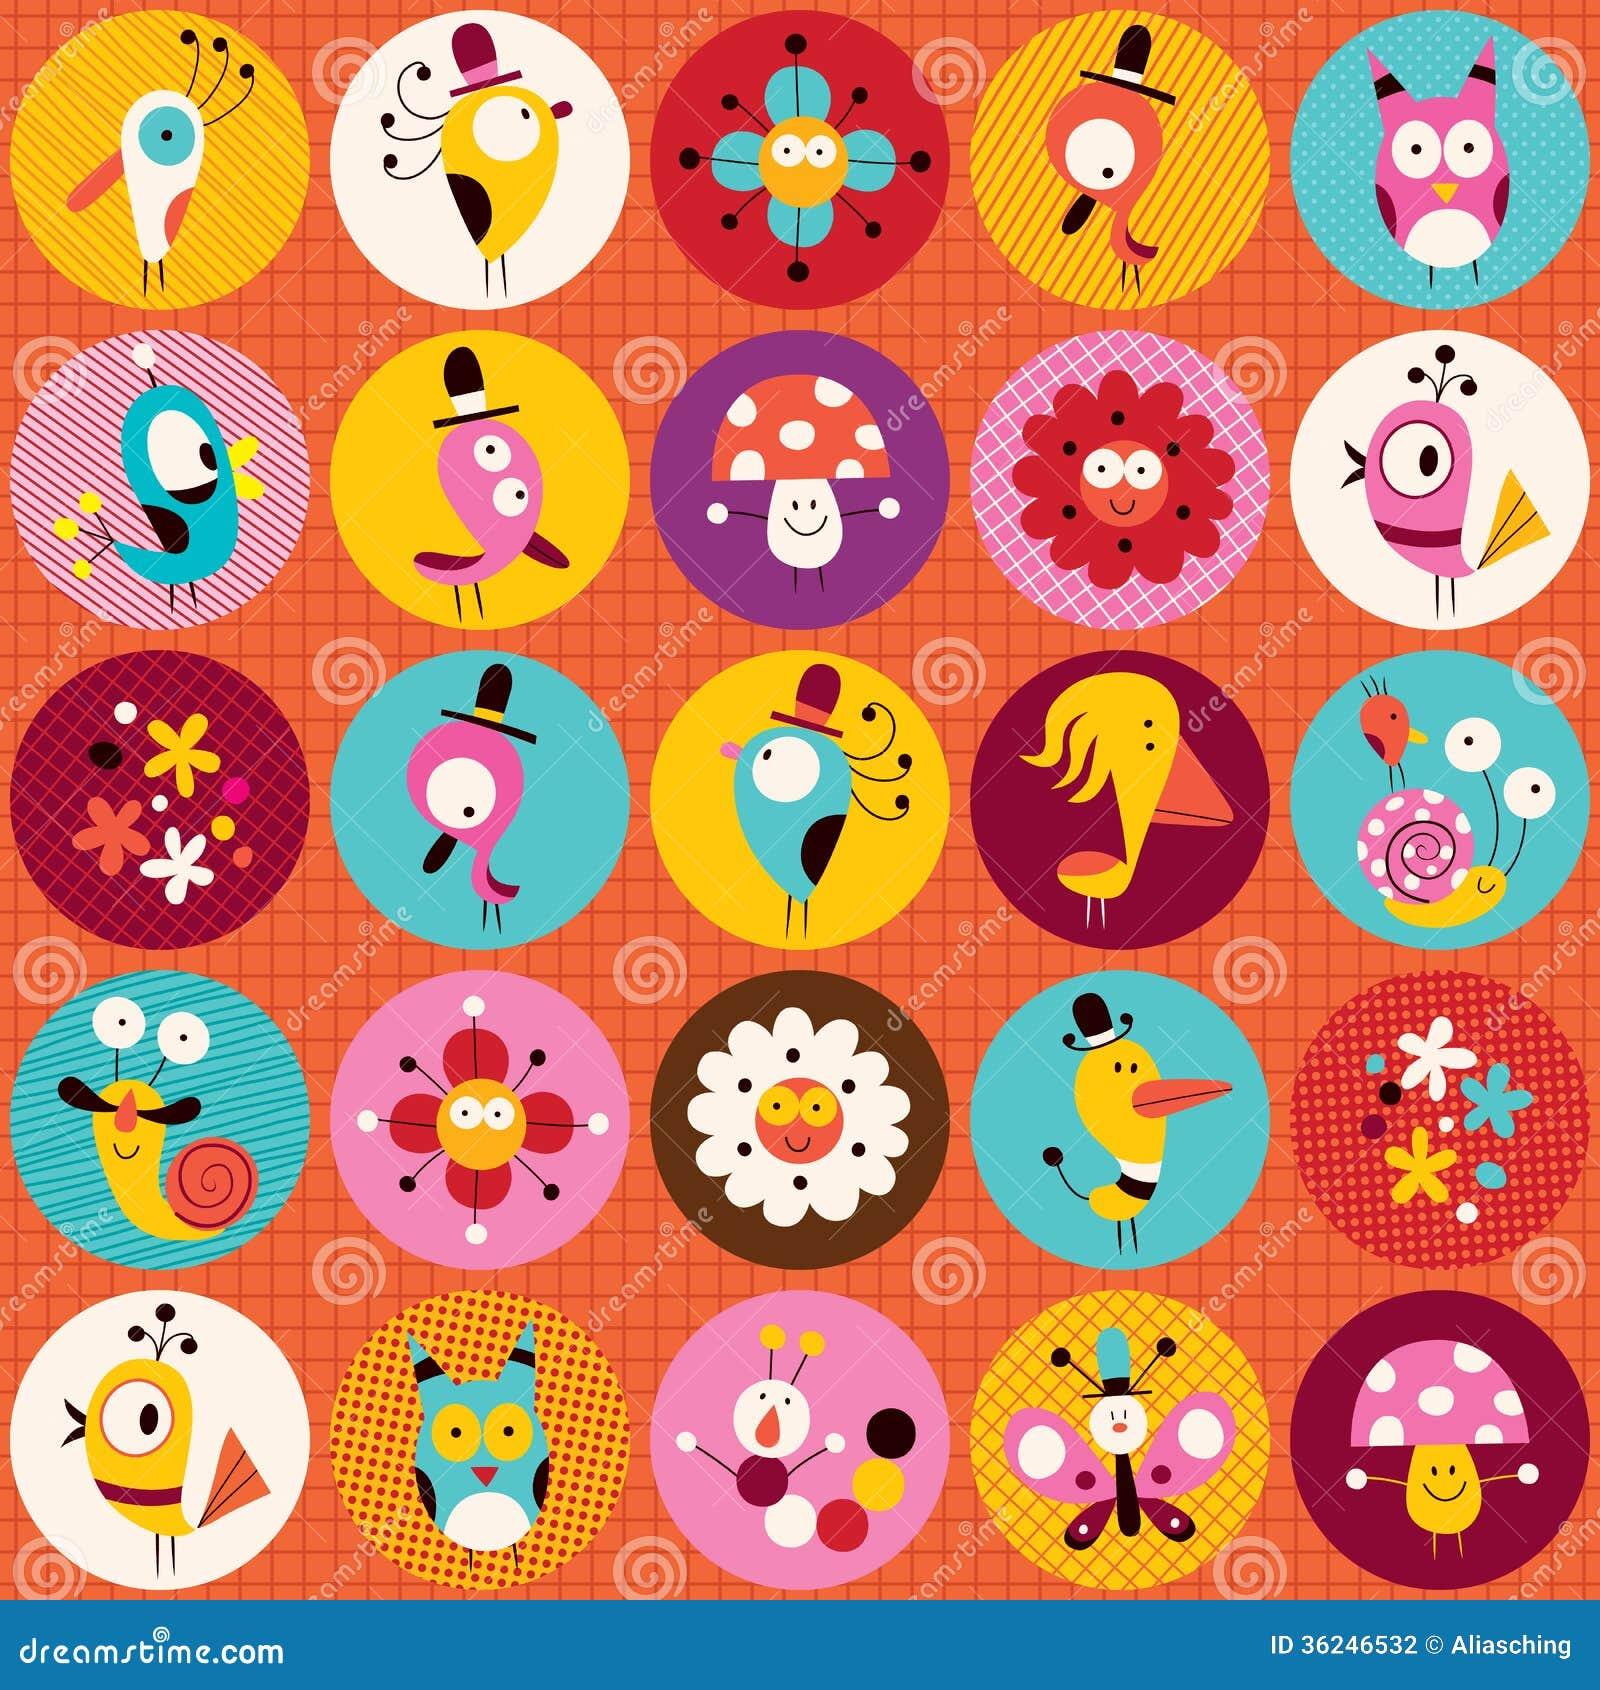 Character Design Kawaii : Cute characters nature pattern stock photography image